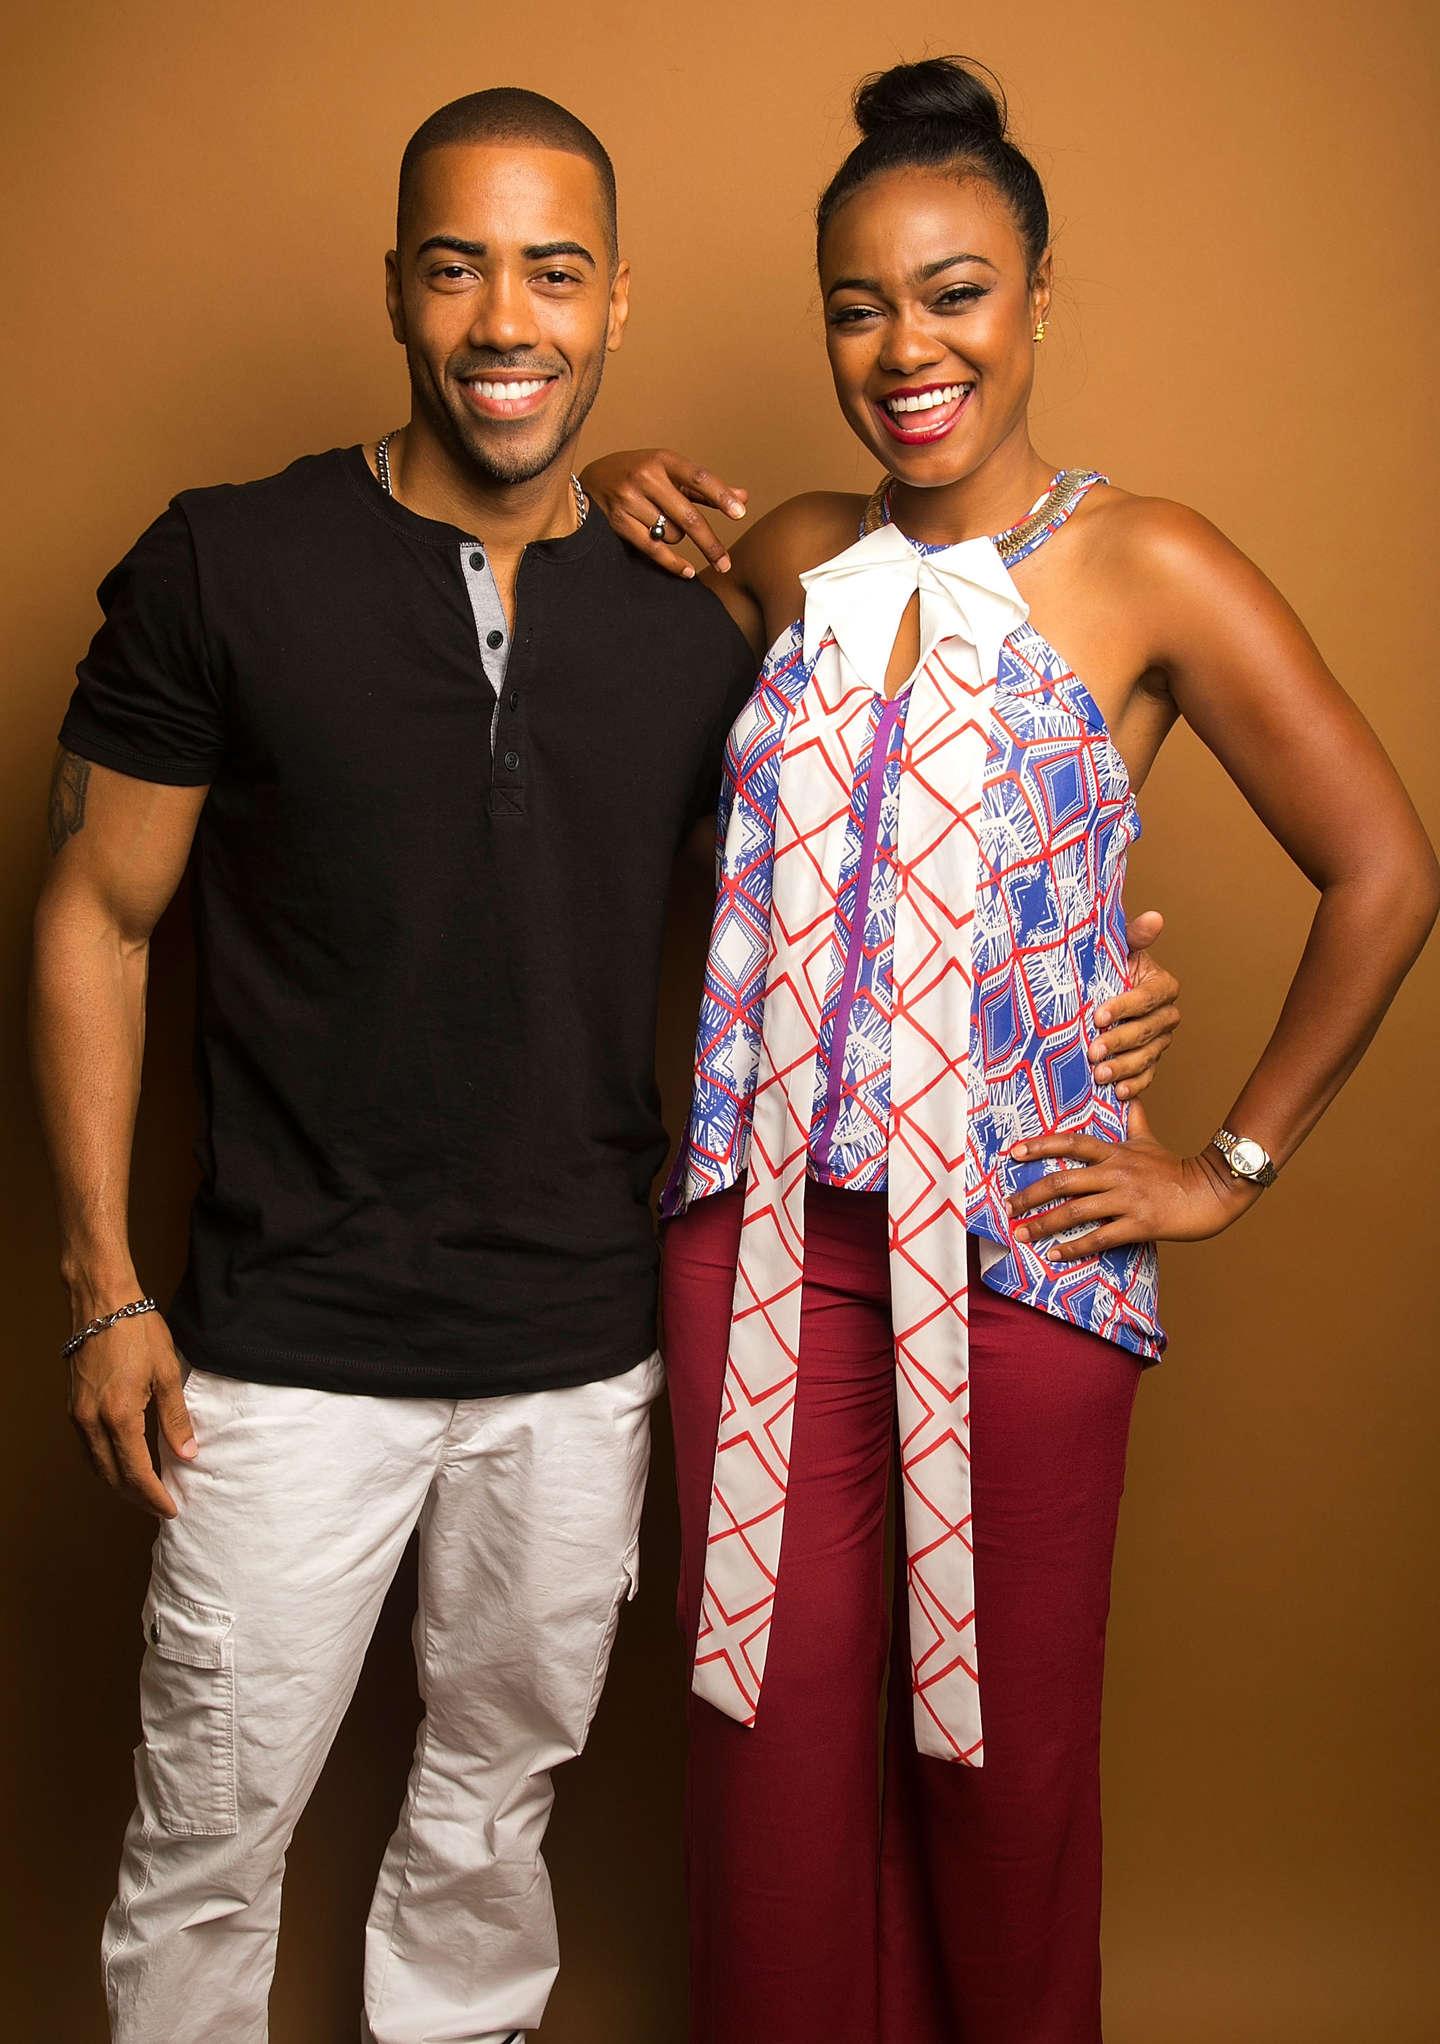 Tatyana Ali American Black Film Festival portraits in New York